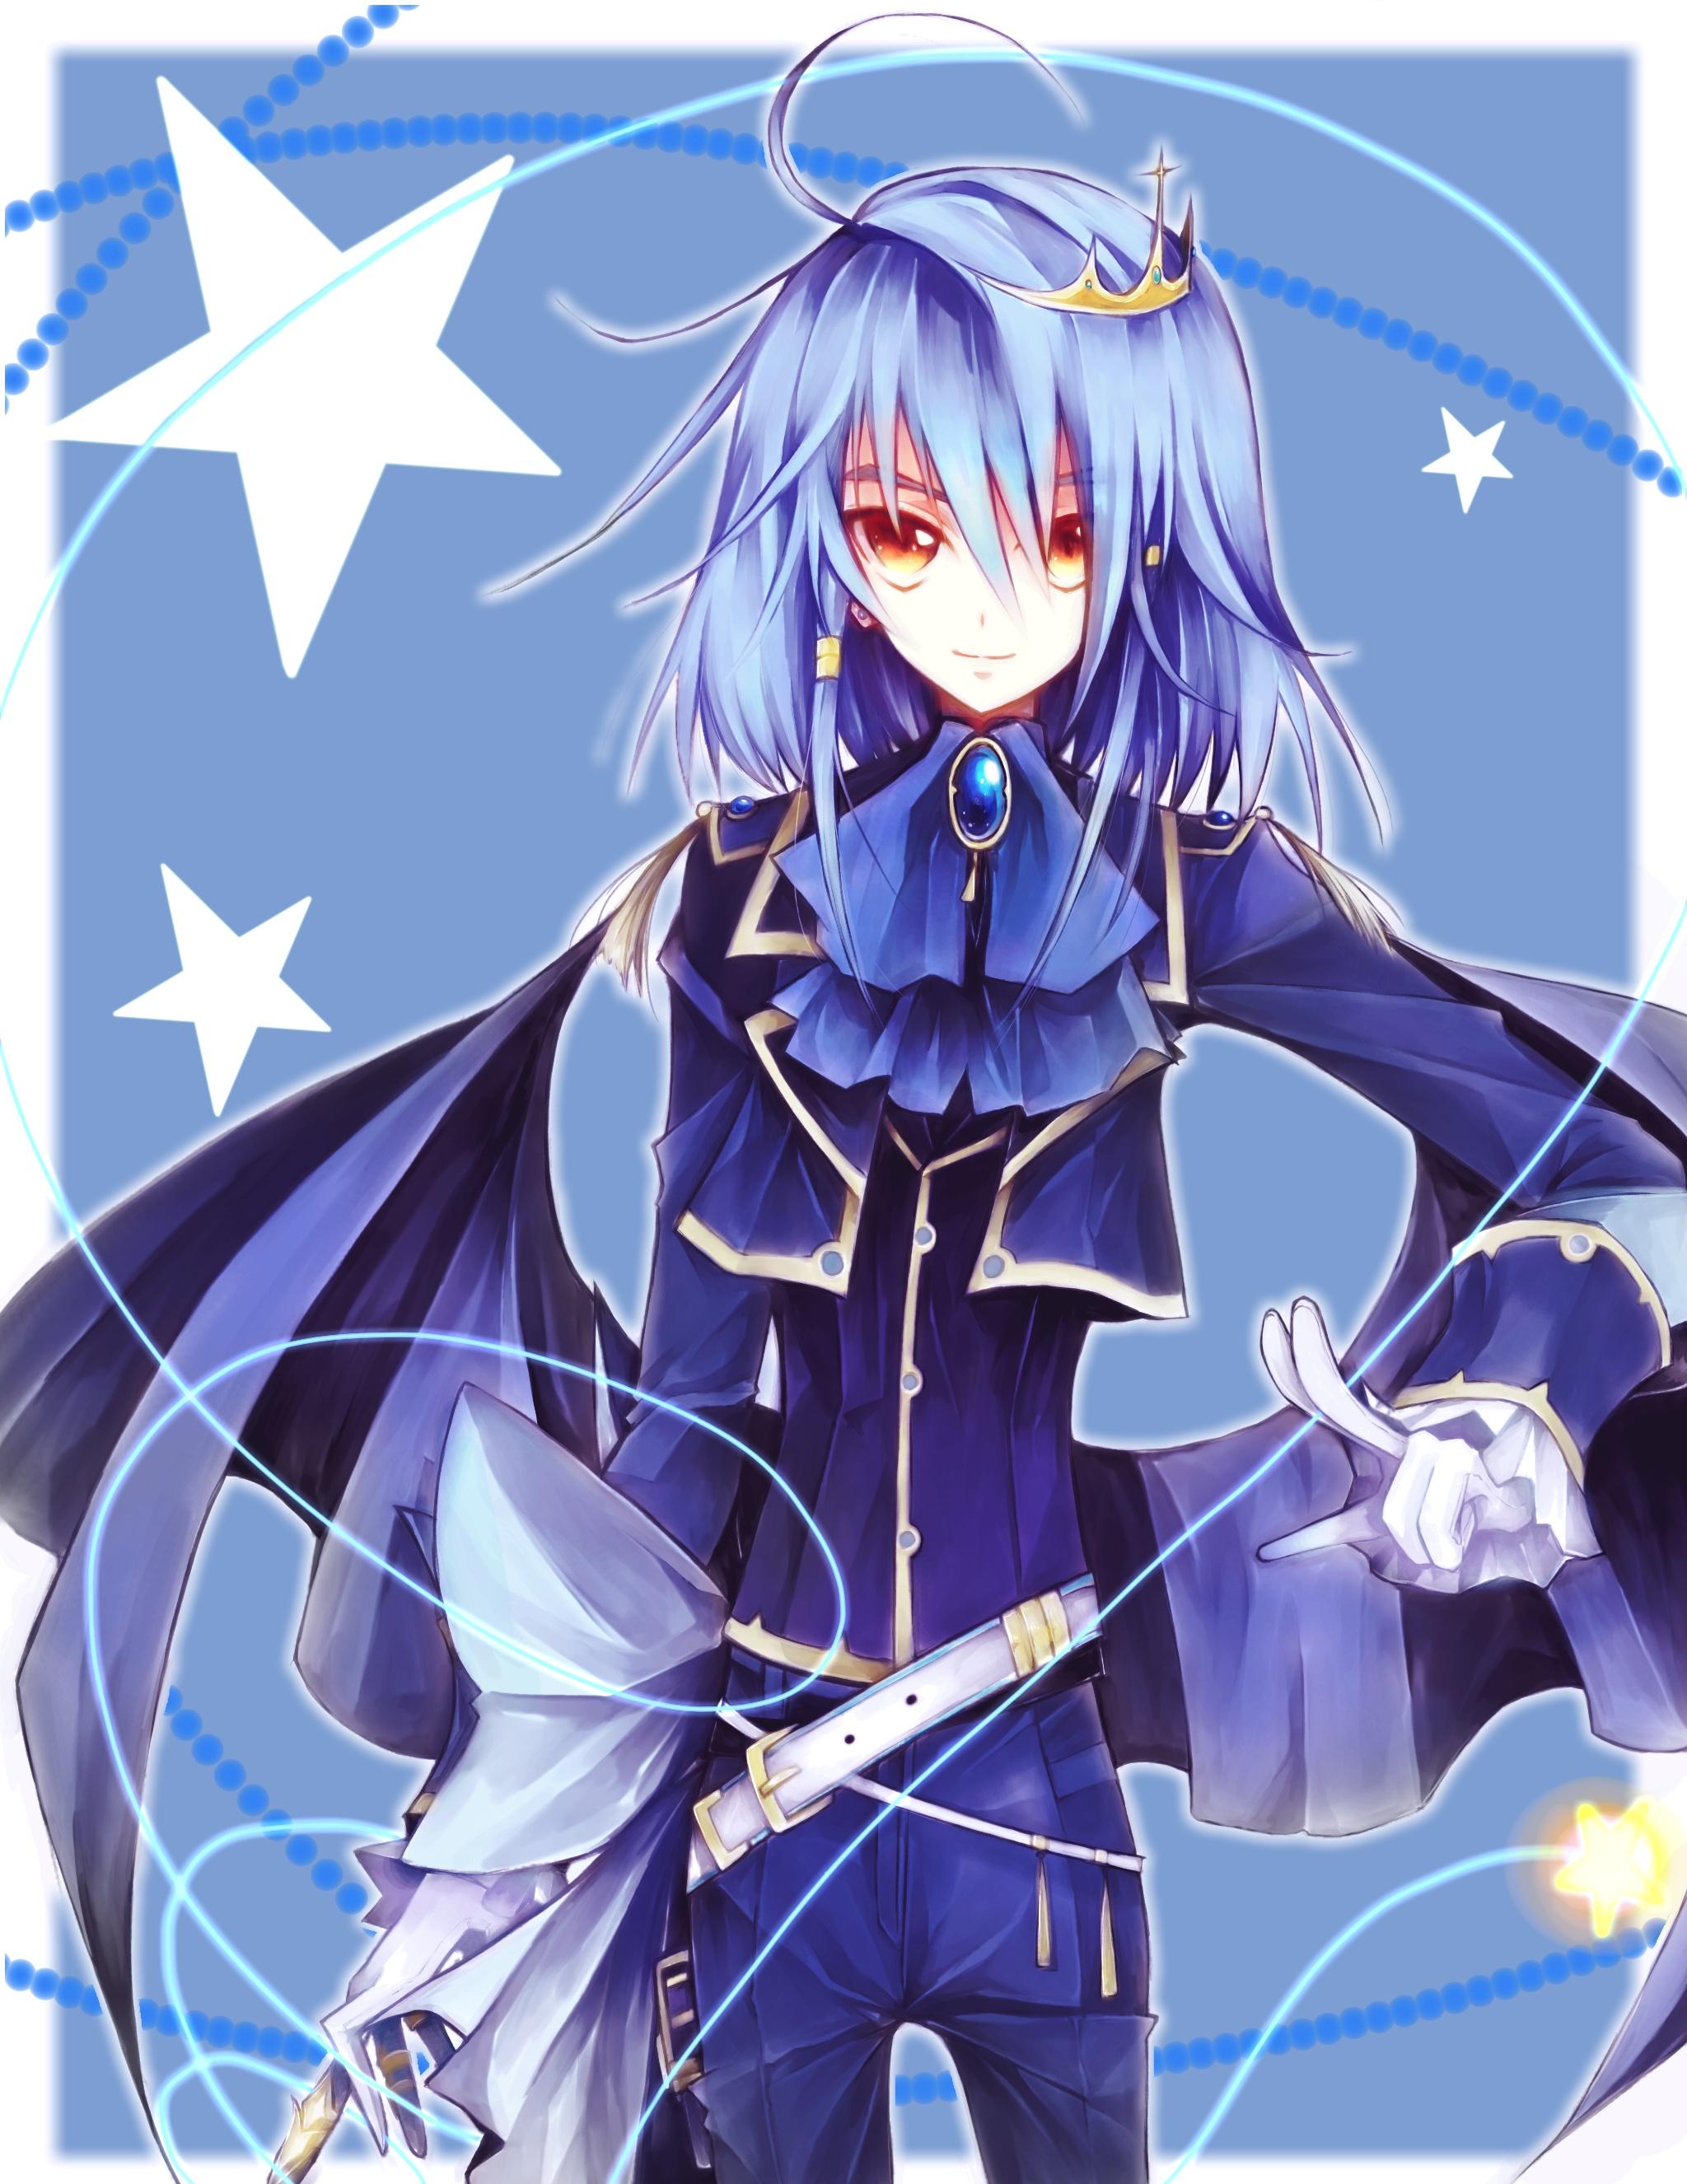 Prince Fluff - Male - Image #1300062 - Zerochan Anime ...